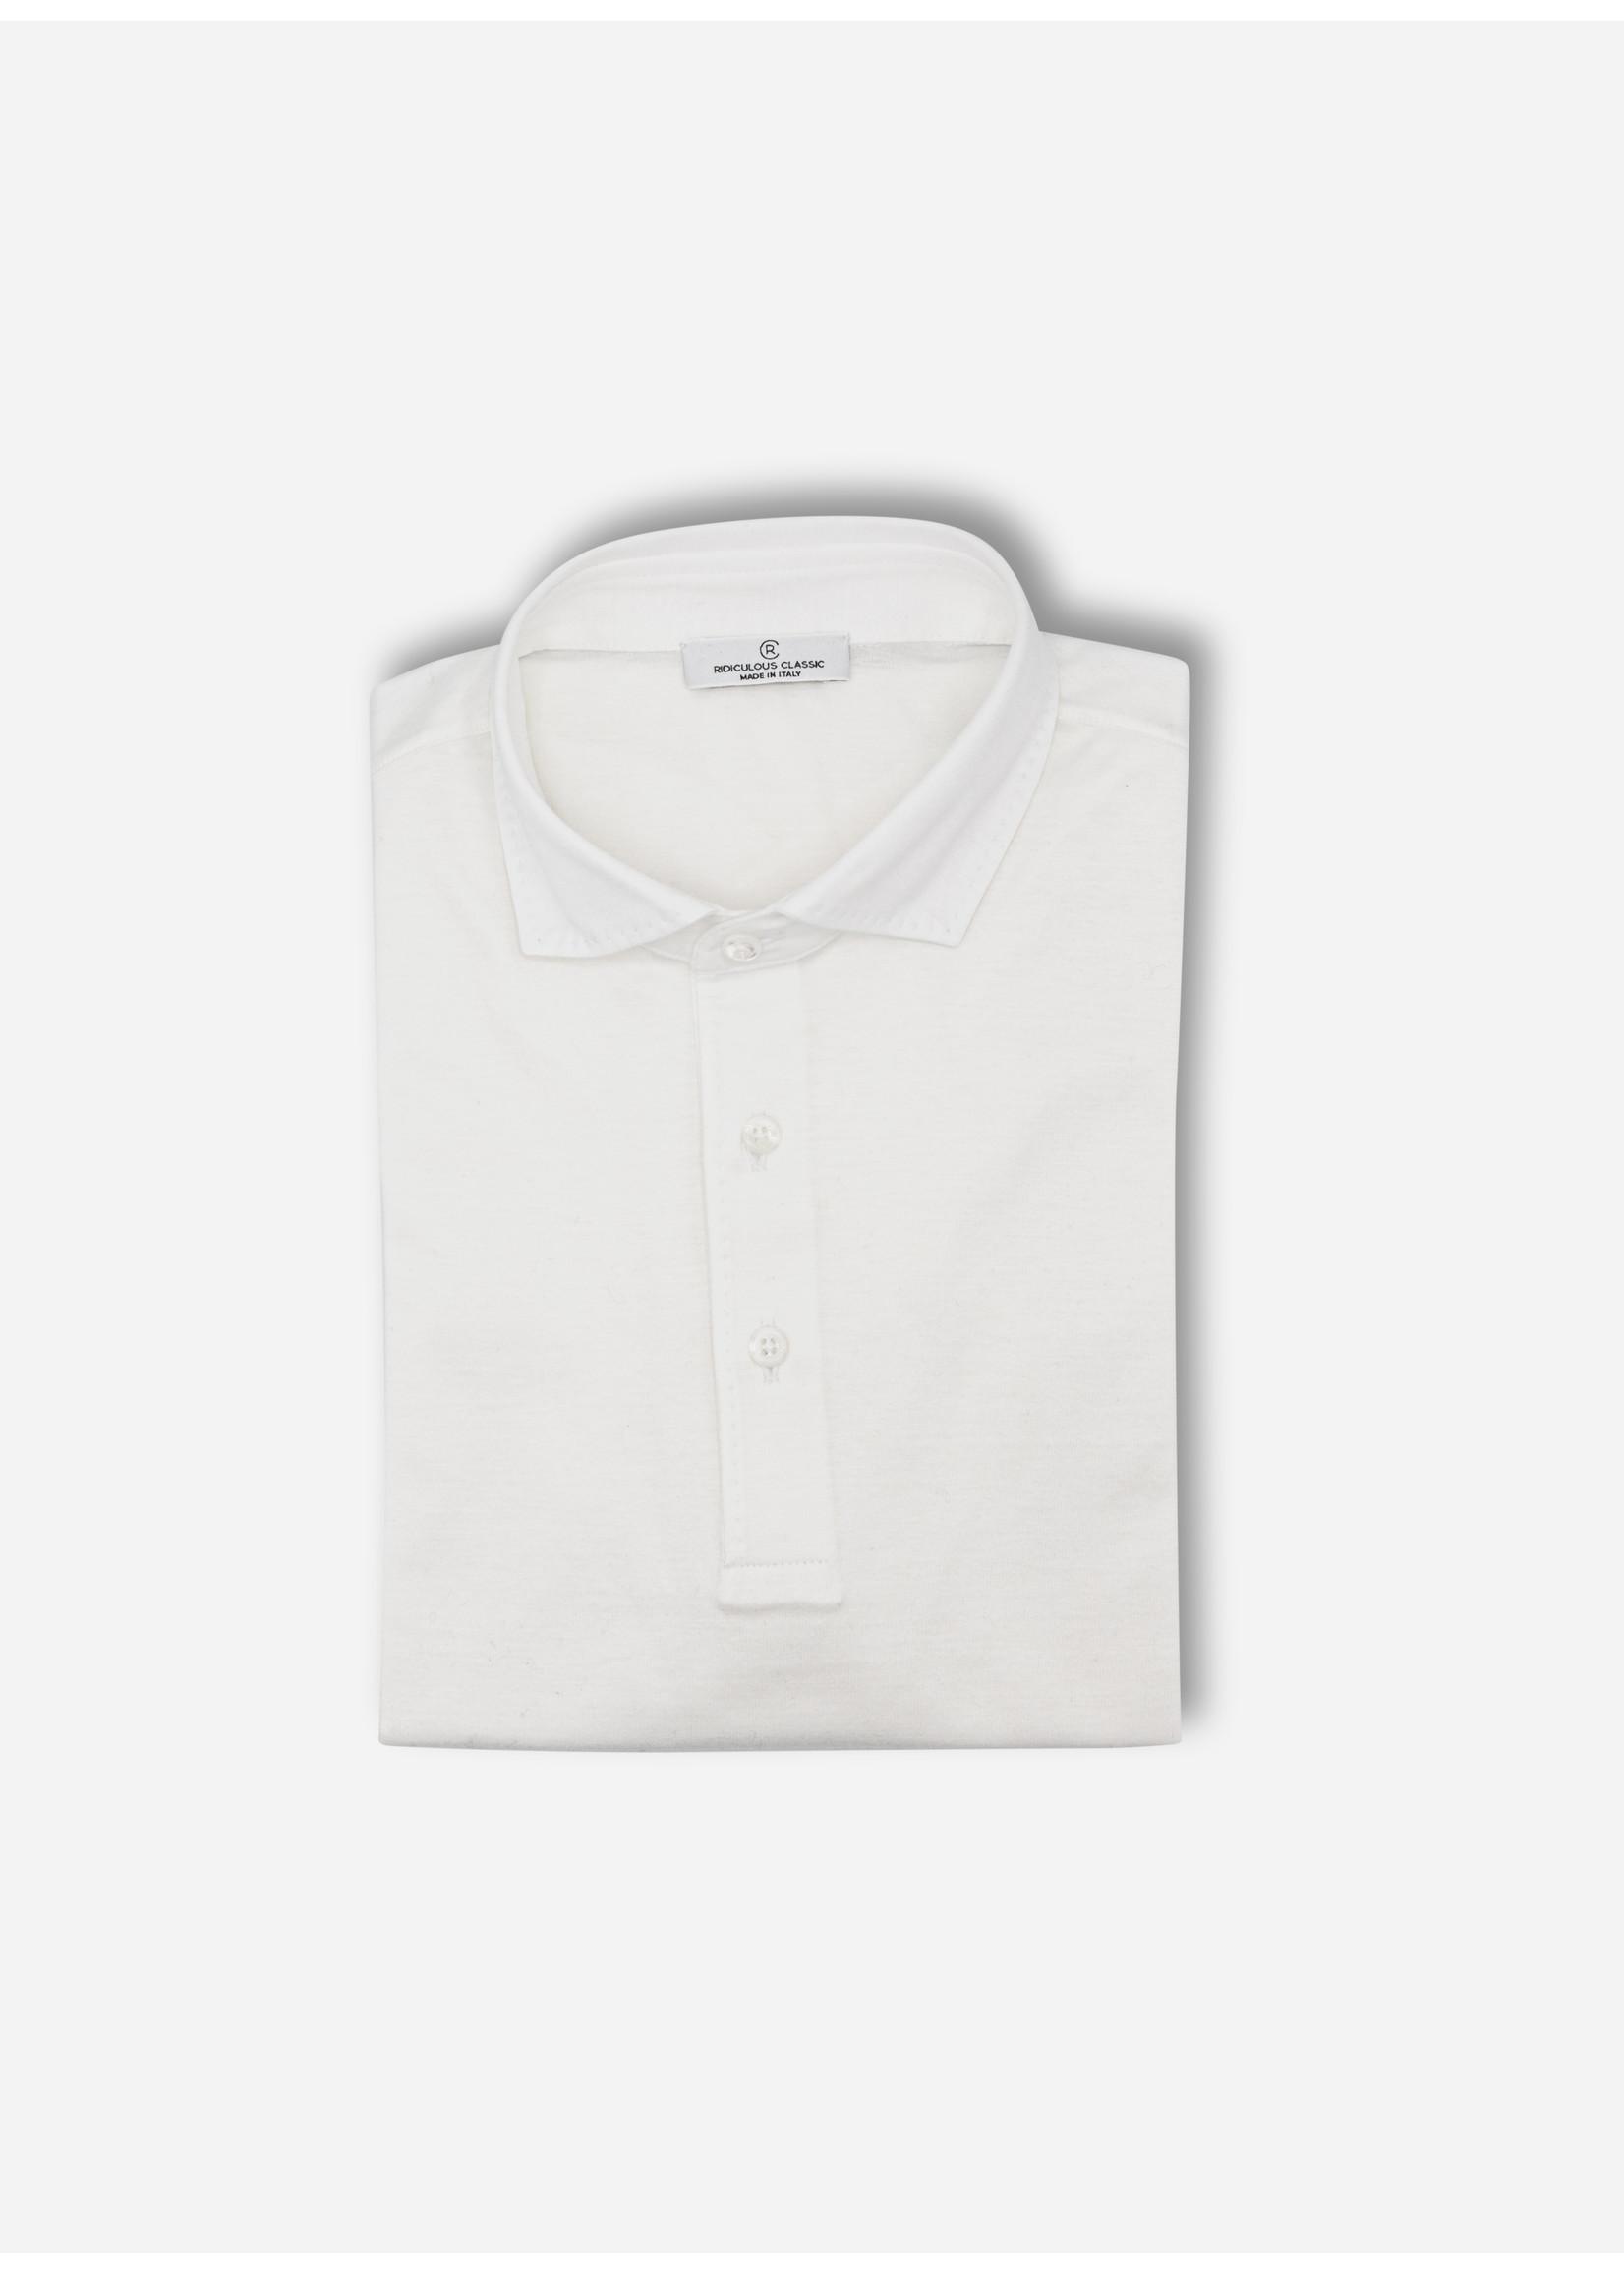 Ridiculous Classic Polo white